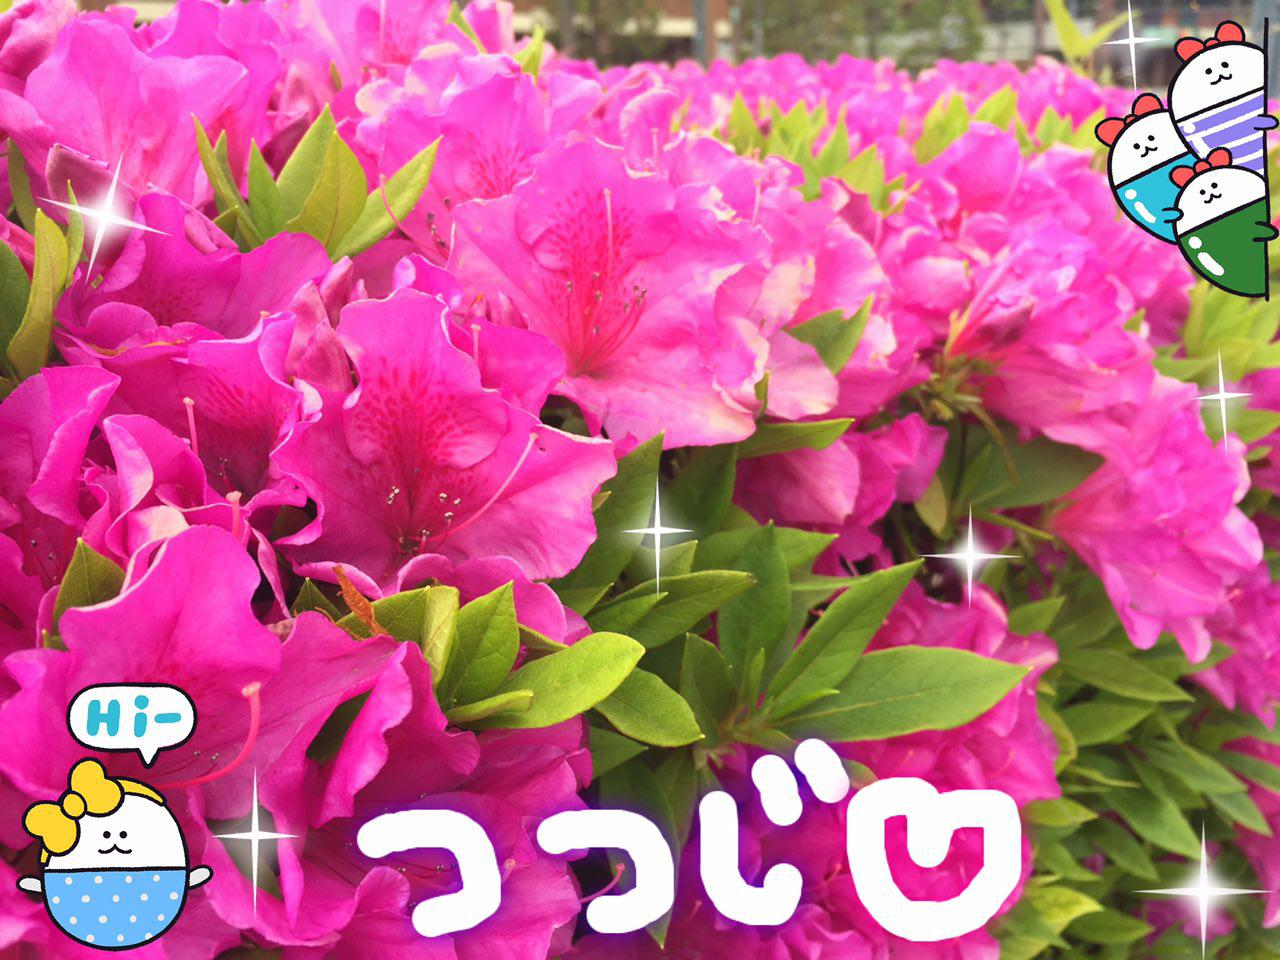 photo_2017-04-26_23-49-32.jpg